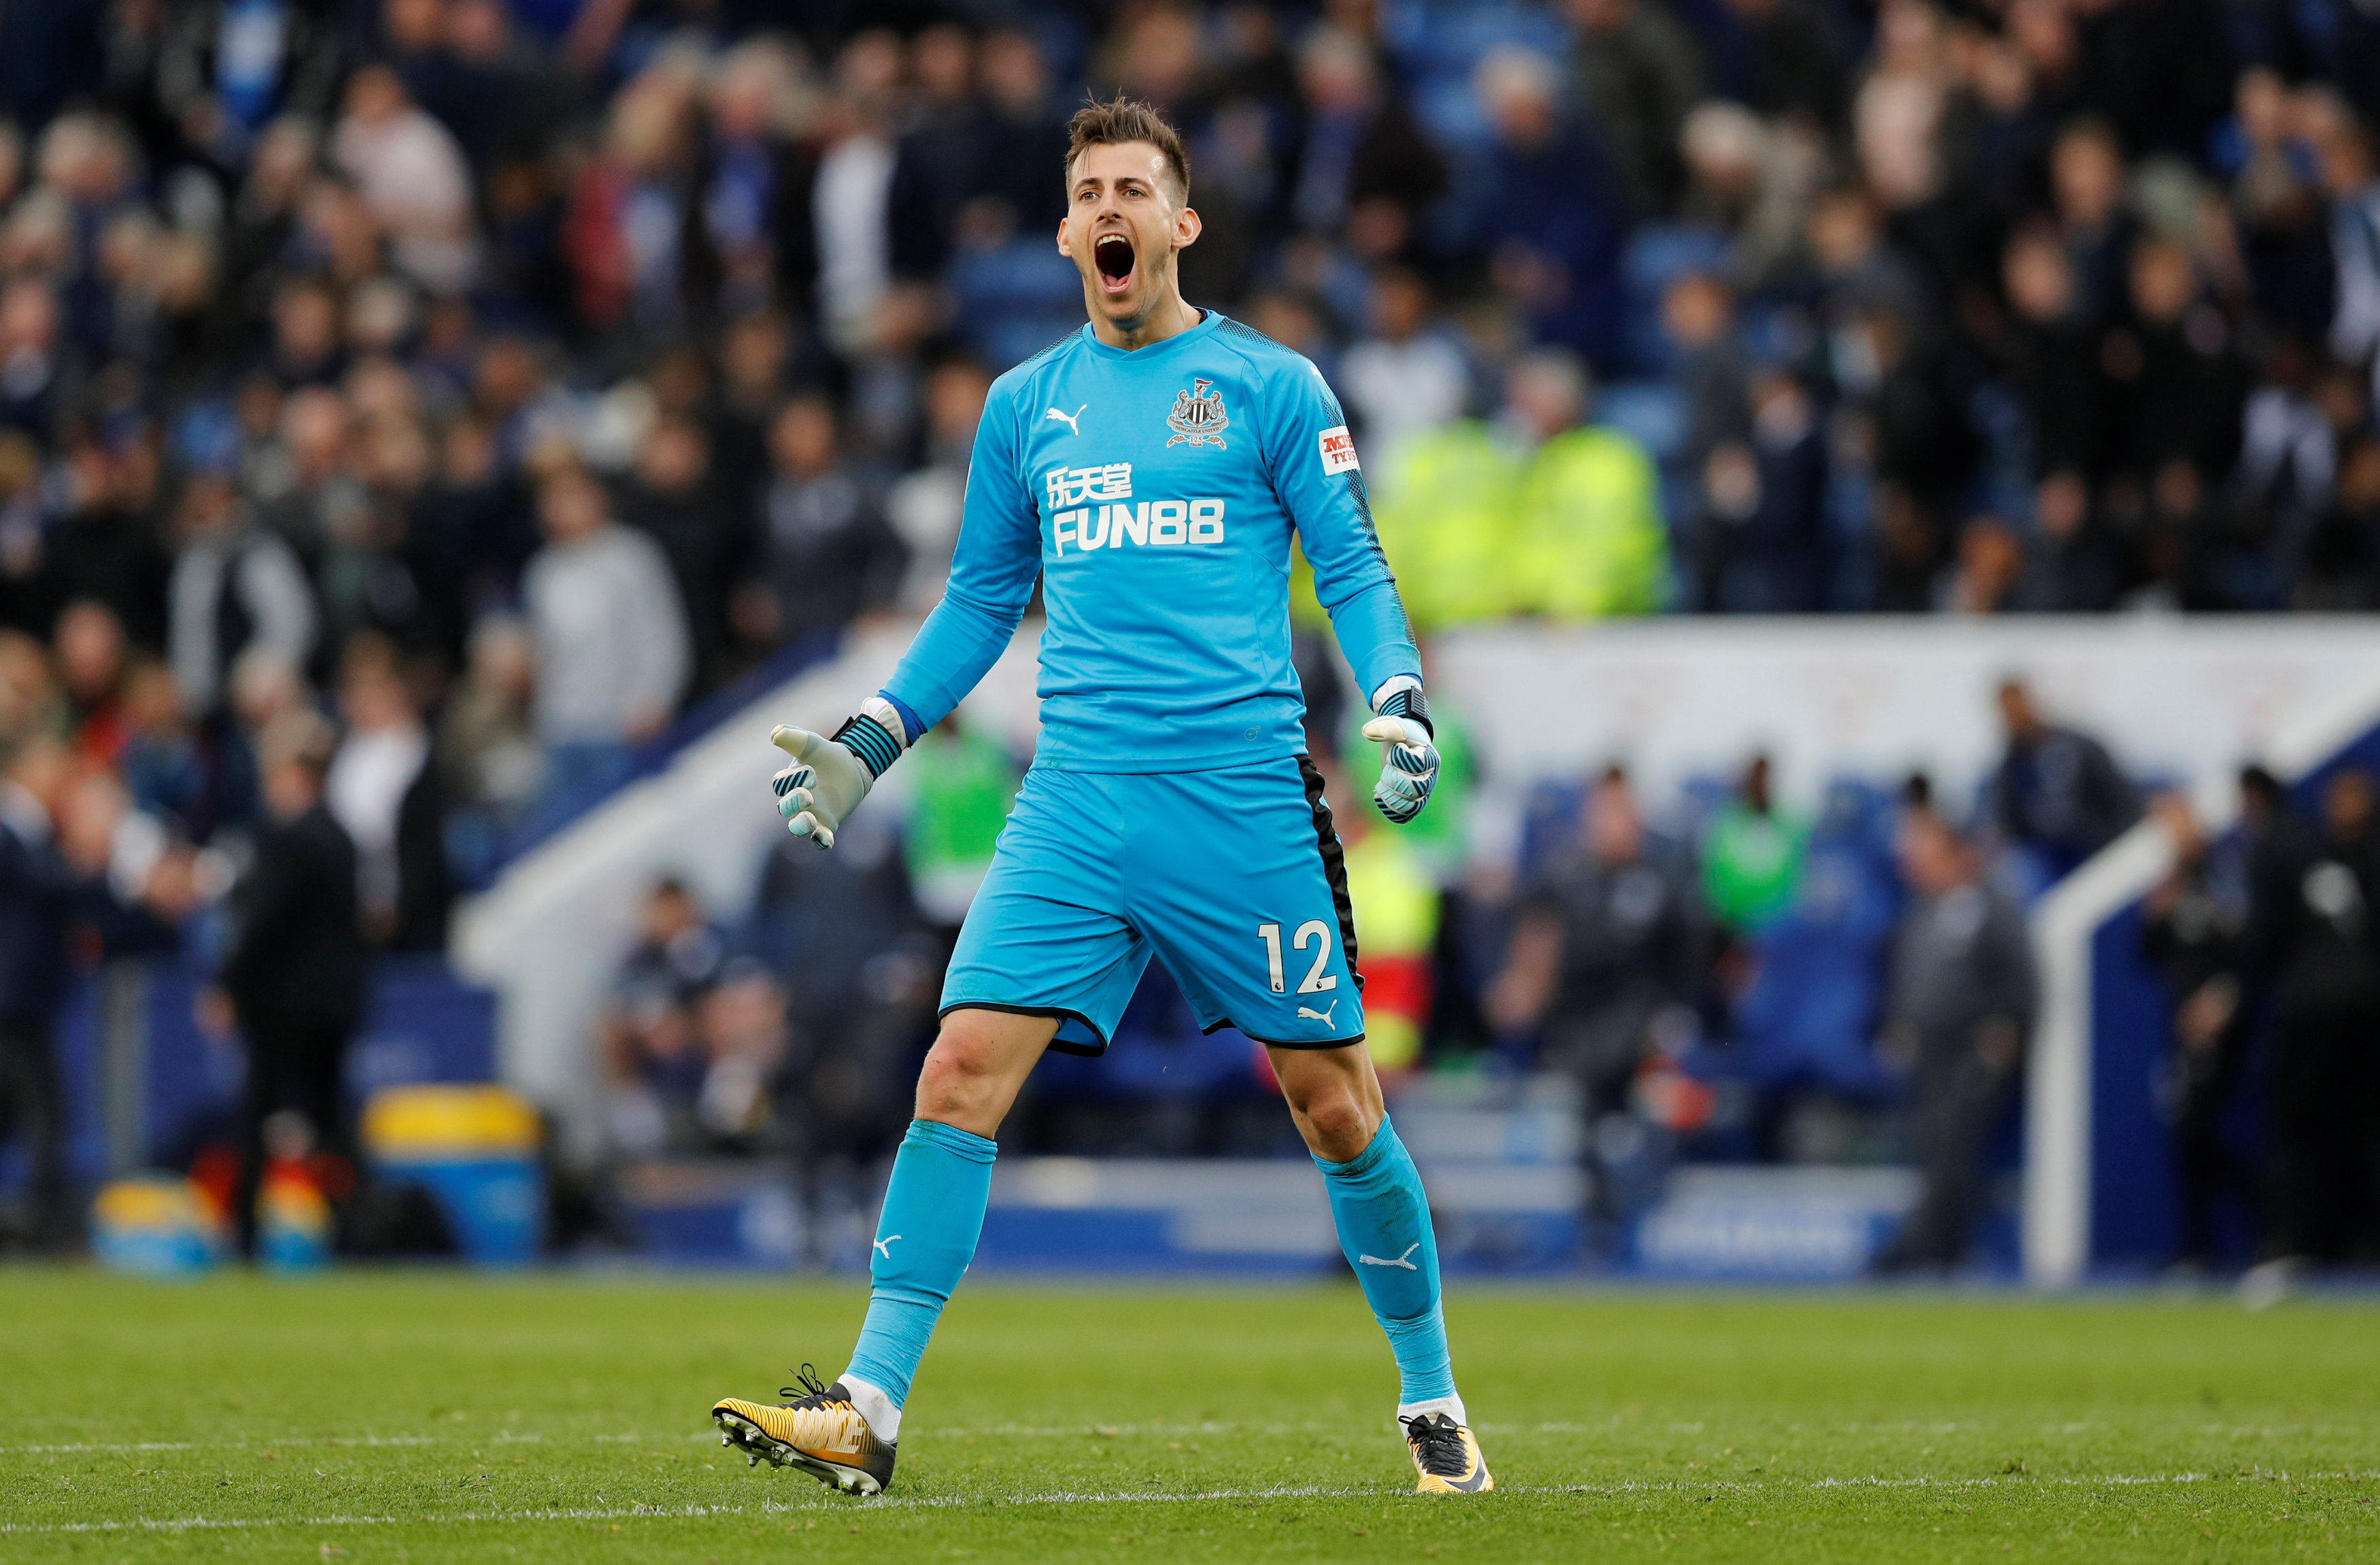 newcastle united fc transfers list 2019- Martin Dubravka